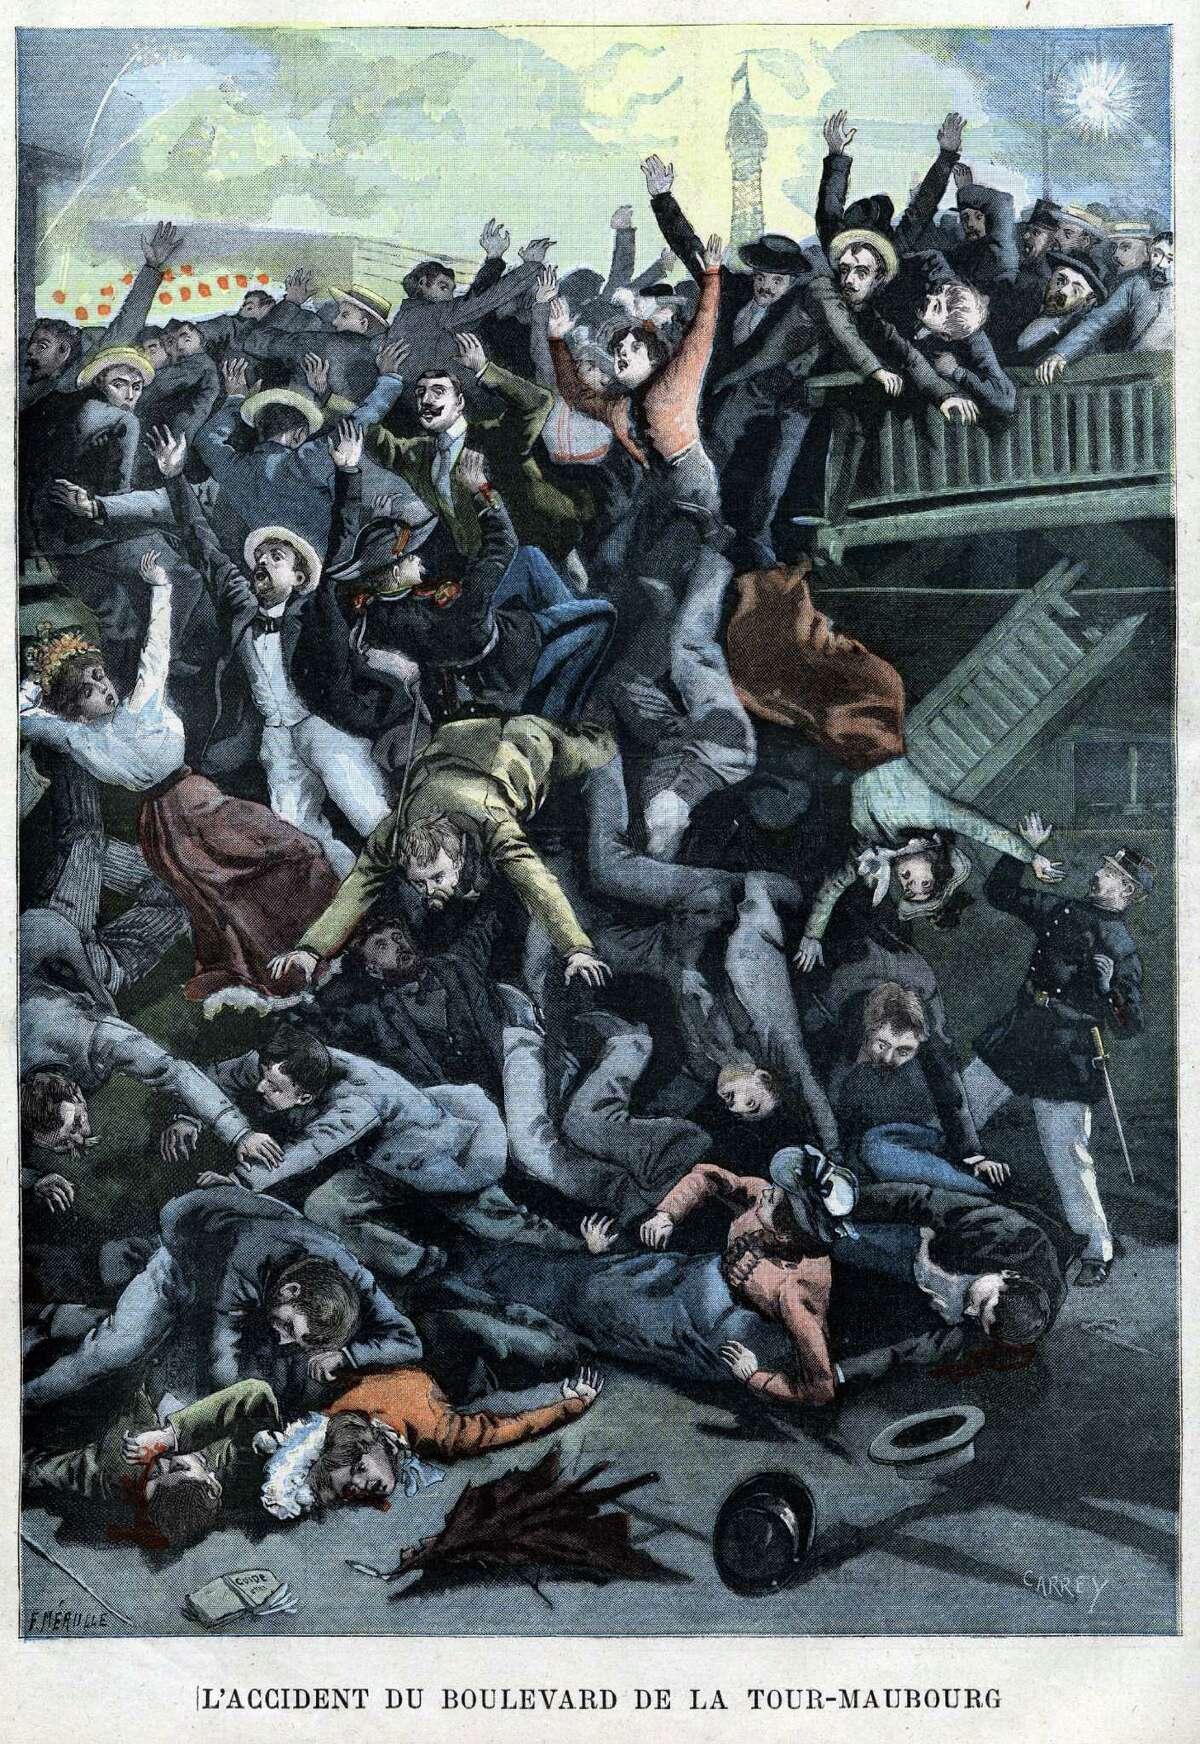 Collapse of a footbridge, during the 1900 Universal Exhibition, on the Boulevard de la Tour-Maubourg, in Paris, Illustration from French newspaper Le Petit Parisien, 1900,